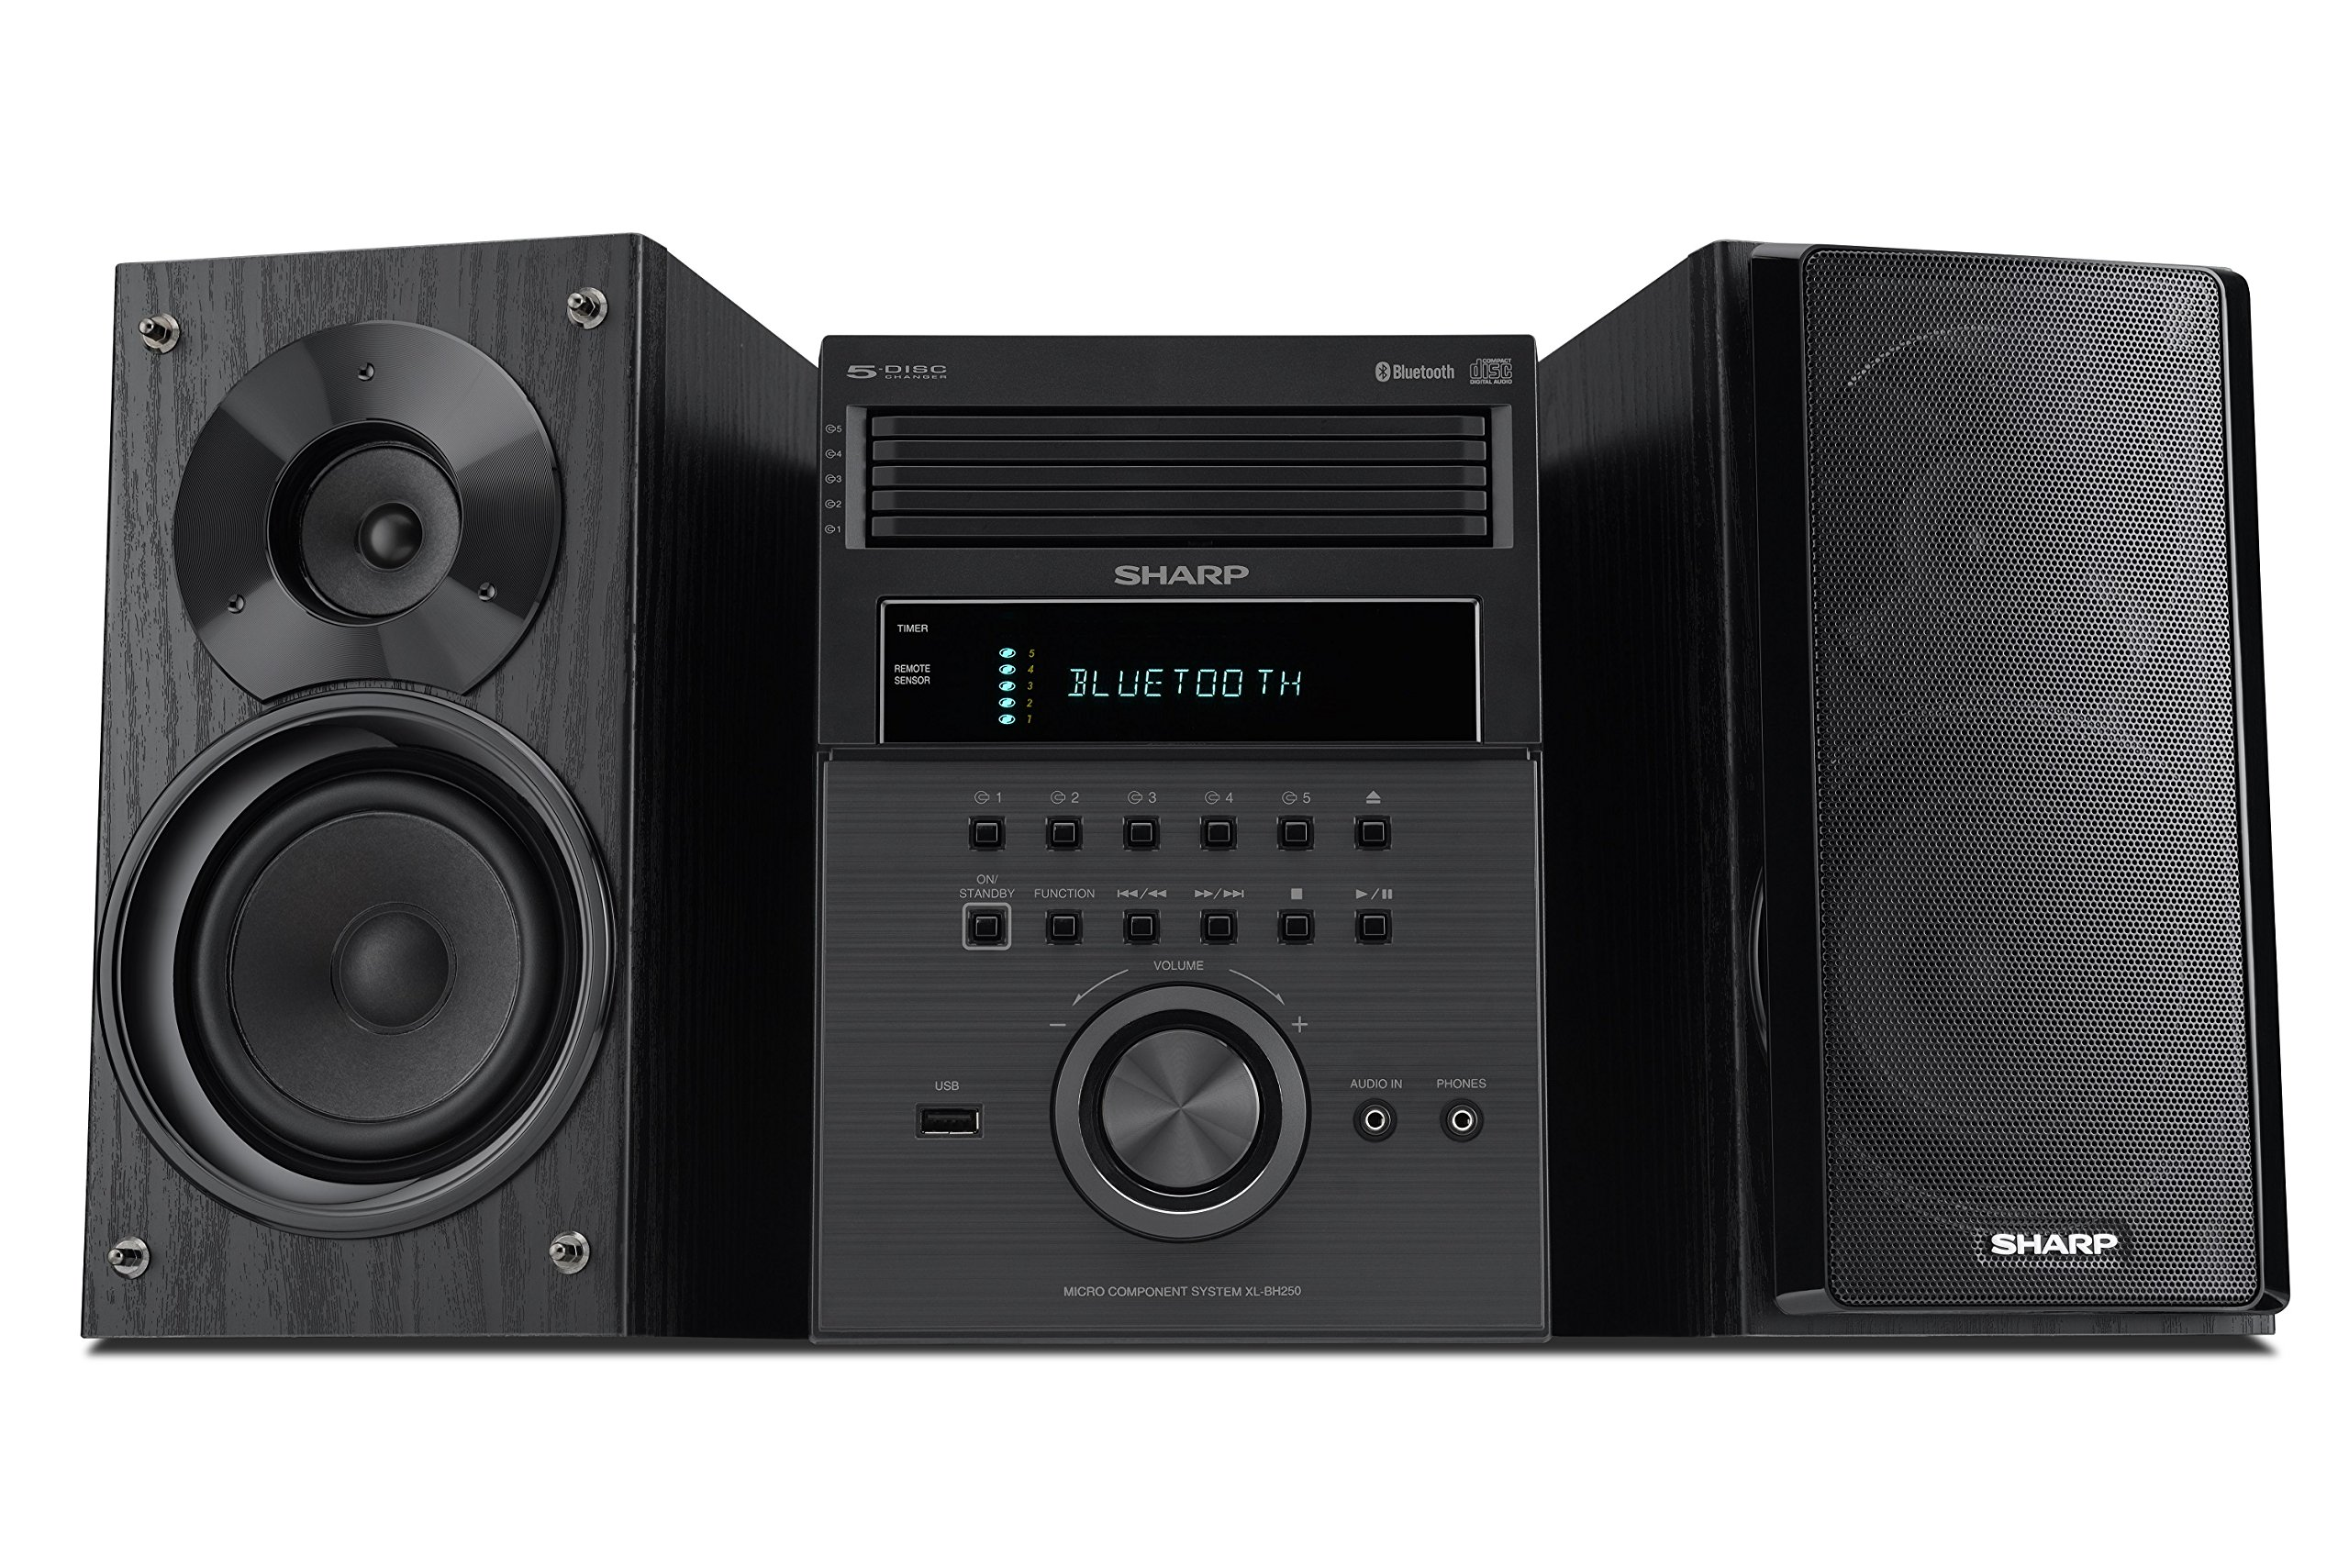 Sharp XL BH250 Executive Bluetooth Playback